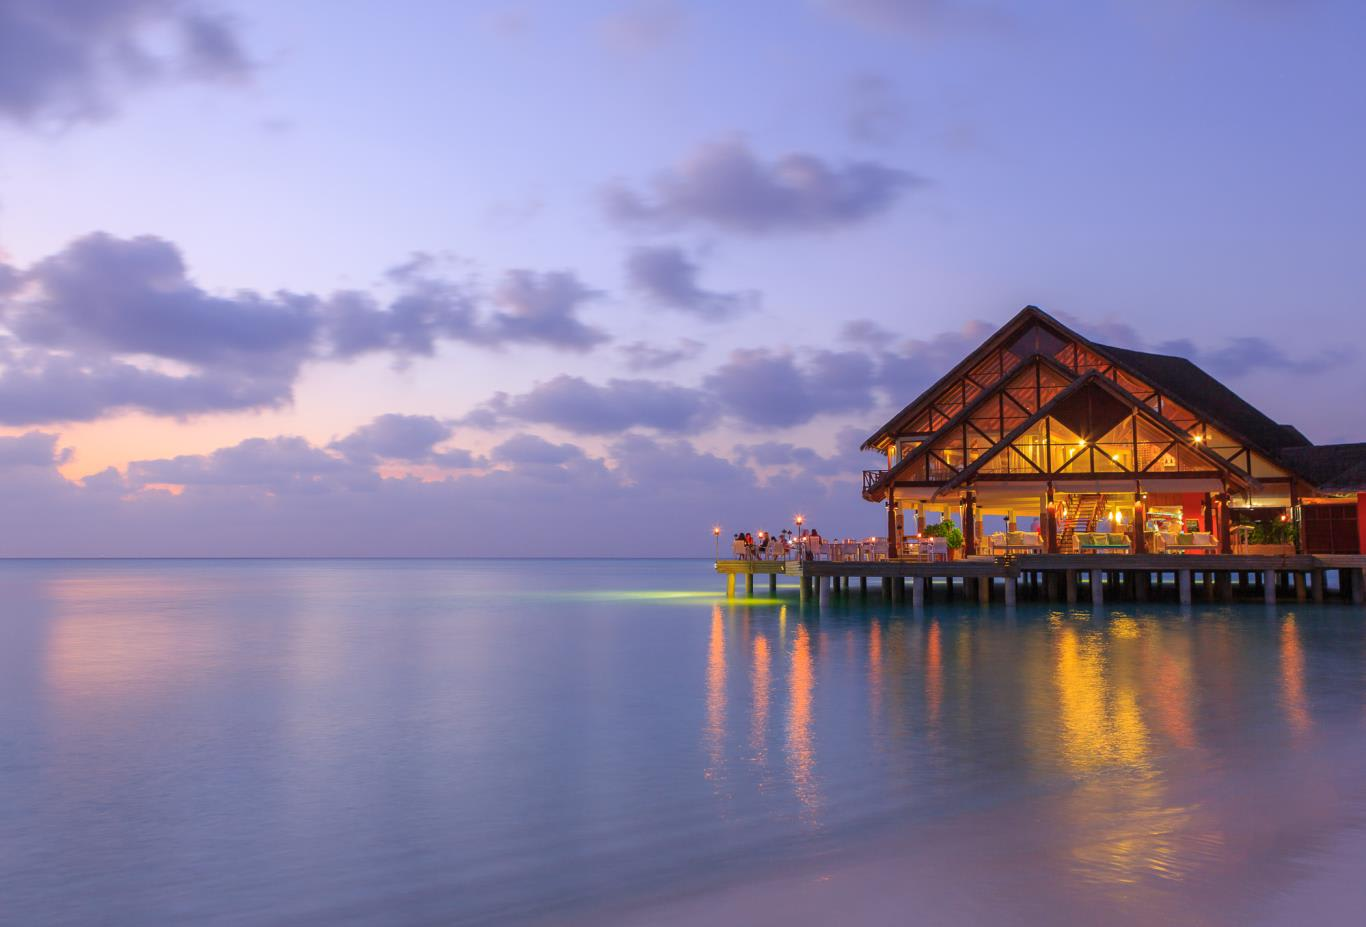 Sea Fire Salt restaurant at dusk